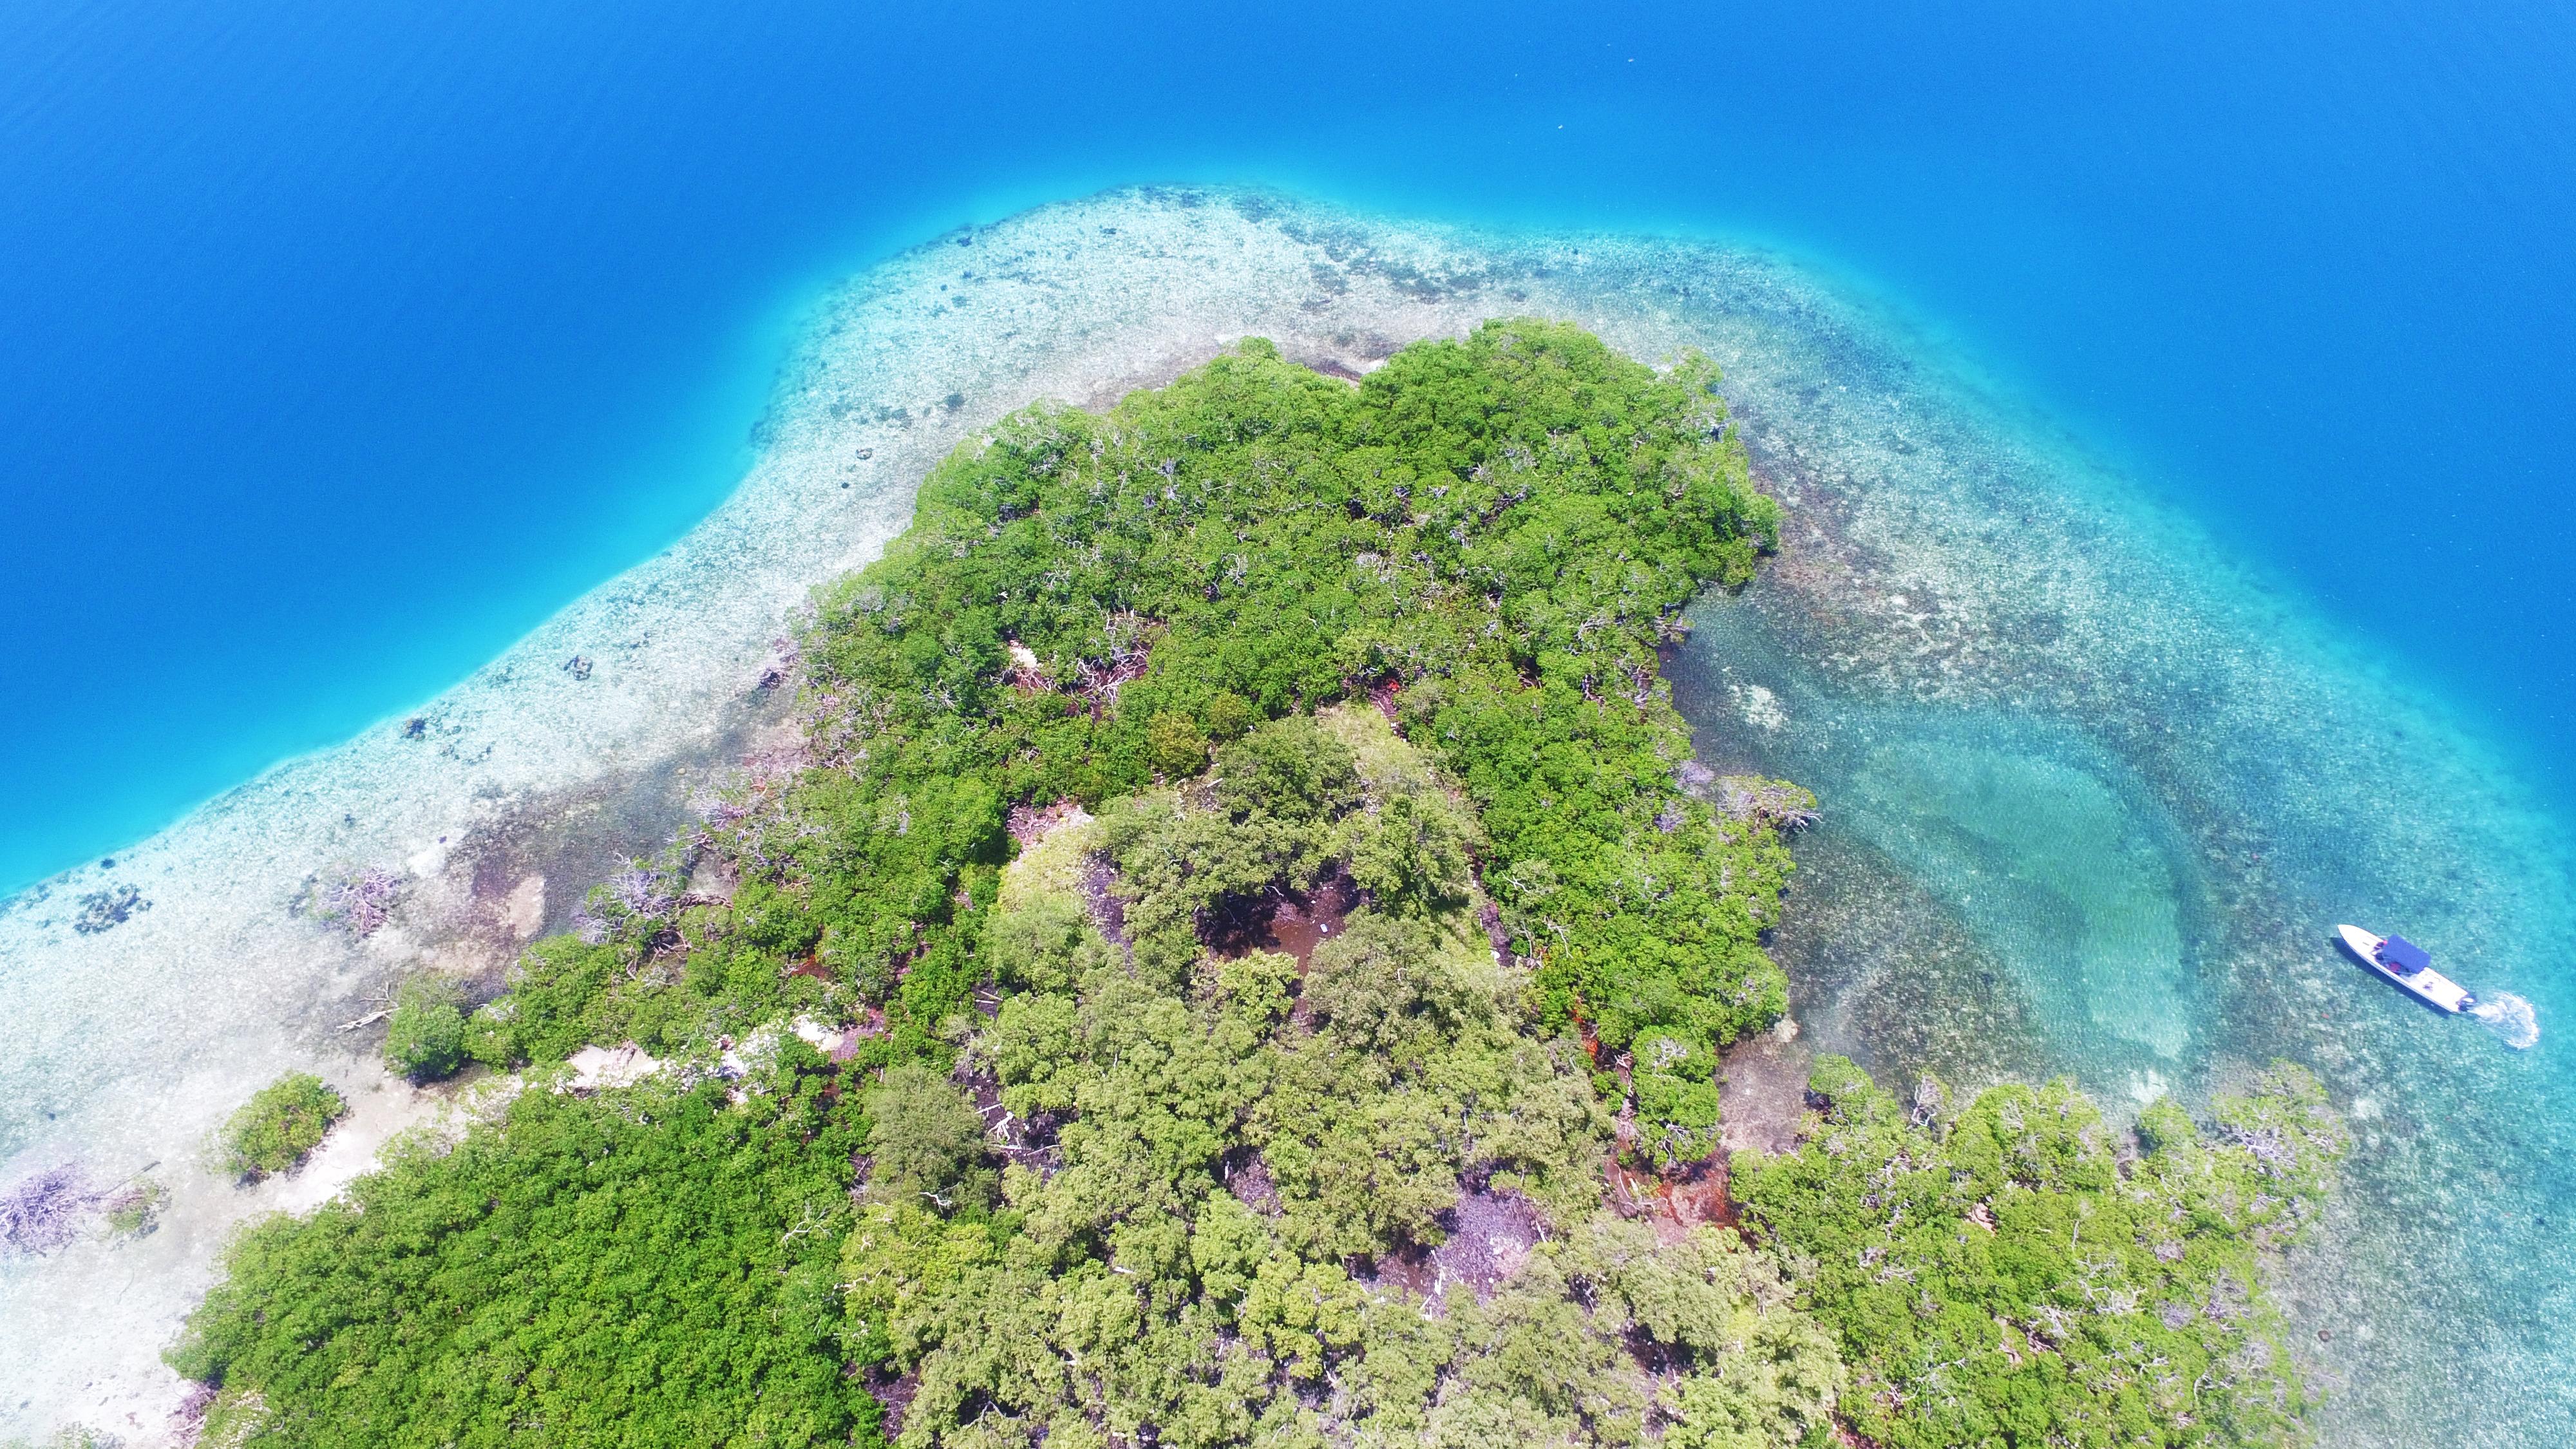 Secret Island - Belize, Central America - Private Islands for Sale